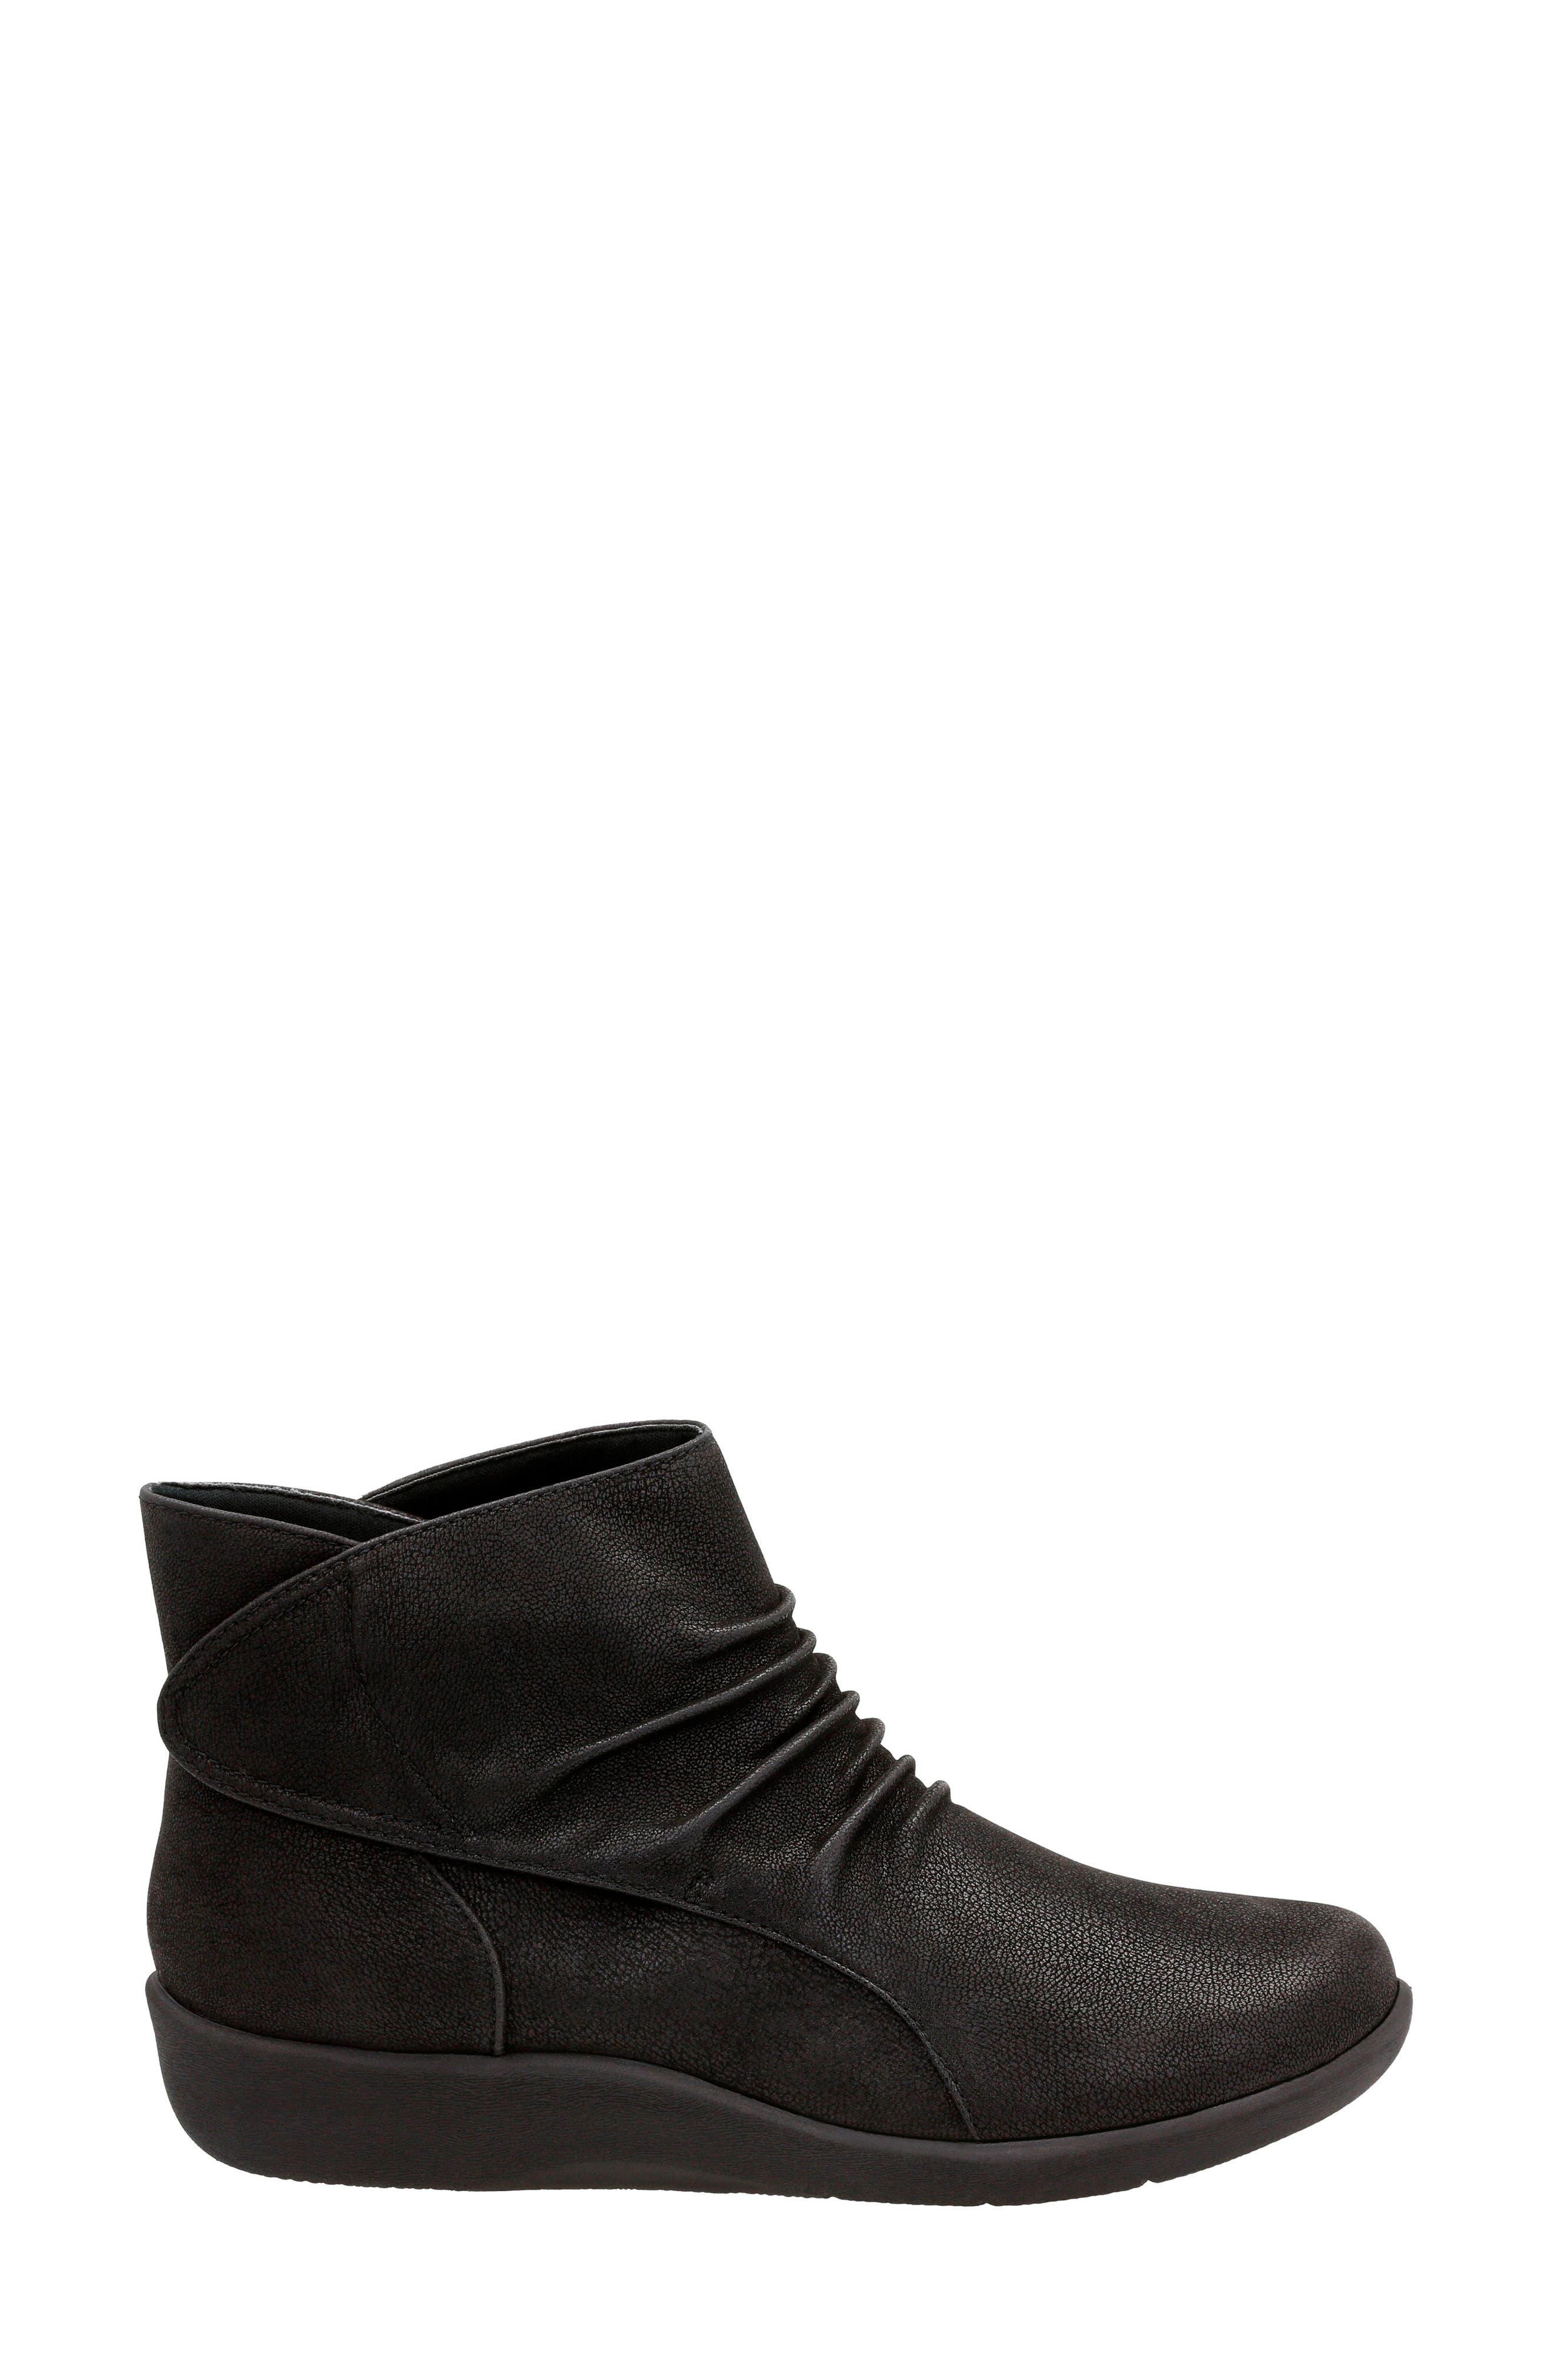 Alternate Image 3  - Clarks® Sillian Sway Boot (Women)